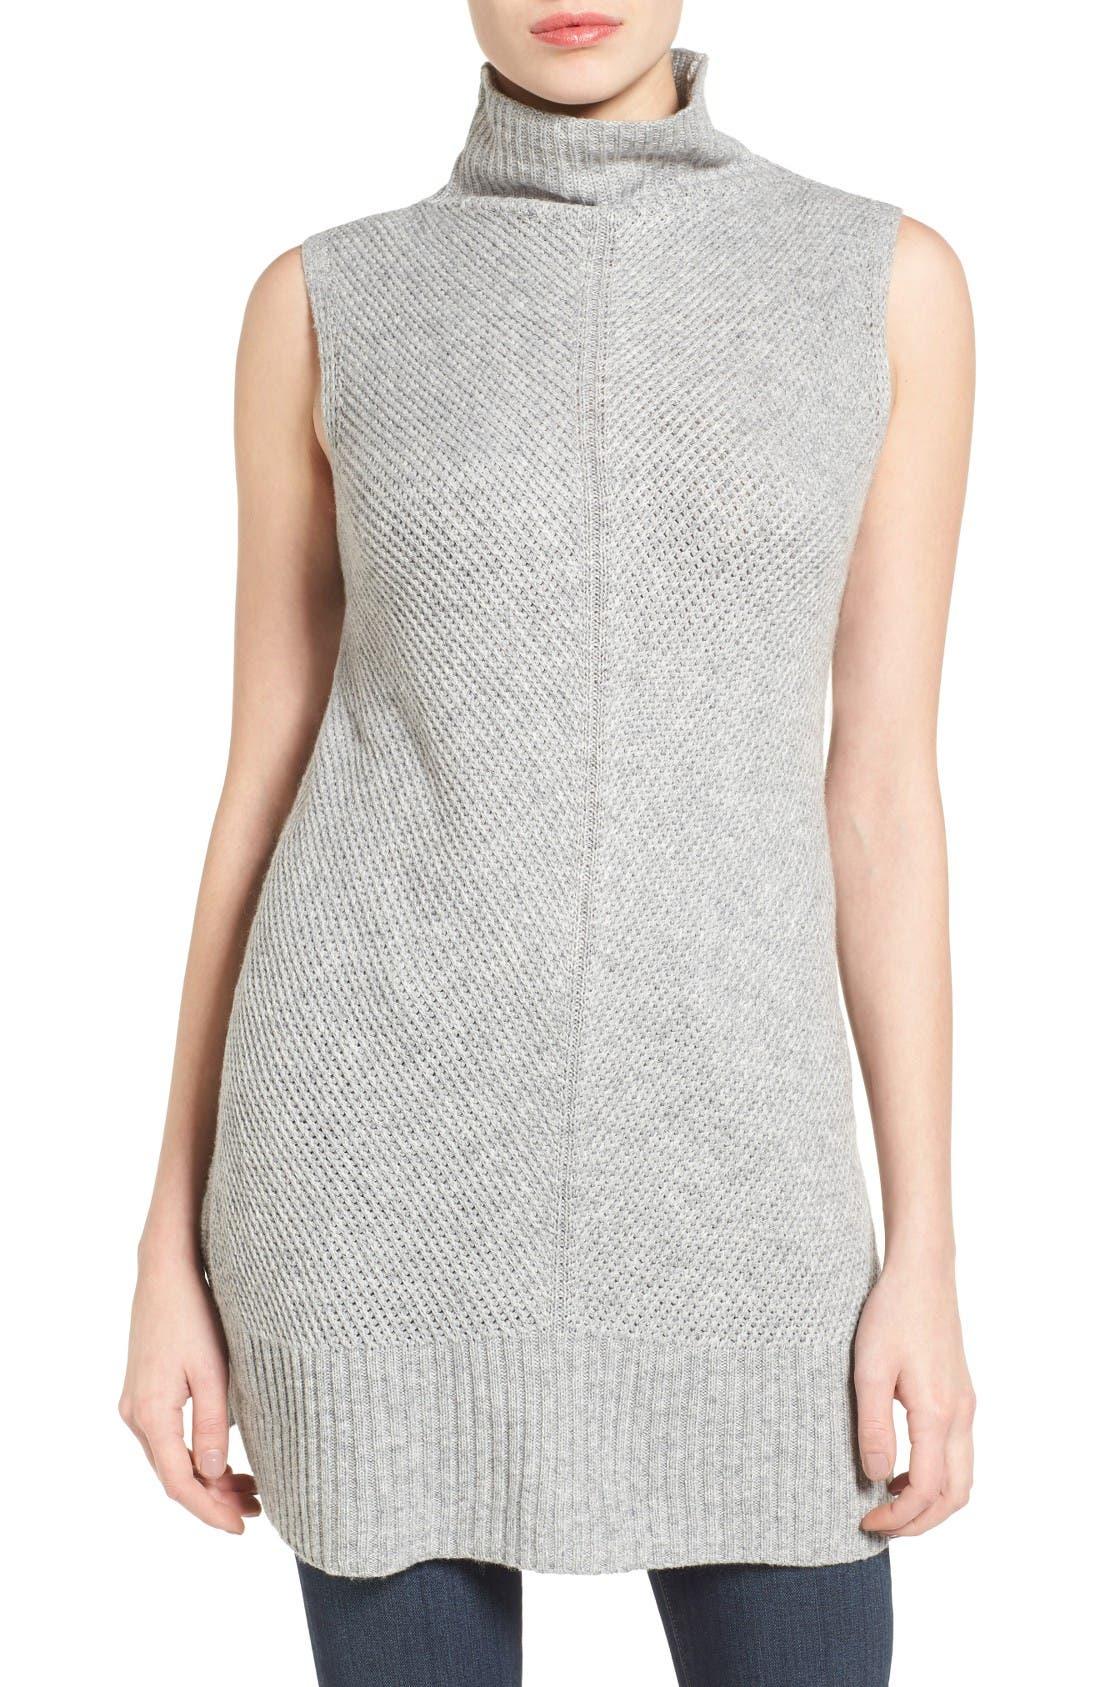 Alternate Image 1 Selected - Halogen® Sleeveless Tunic Sweater (Regular & Petite)